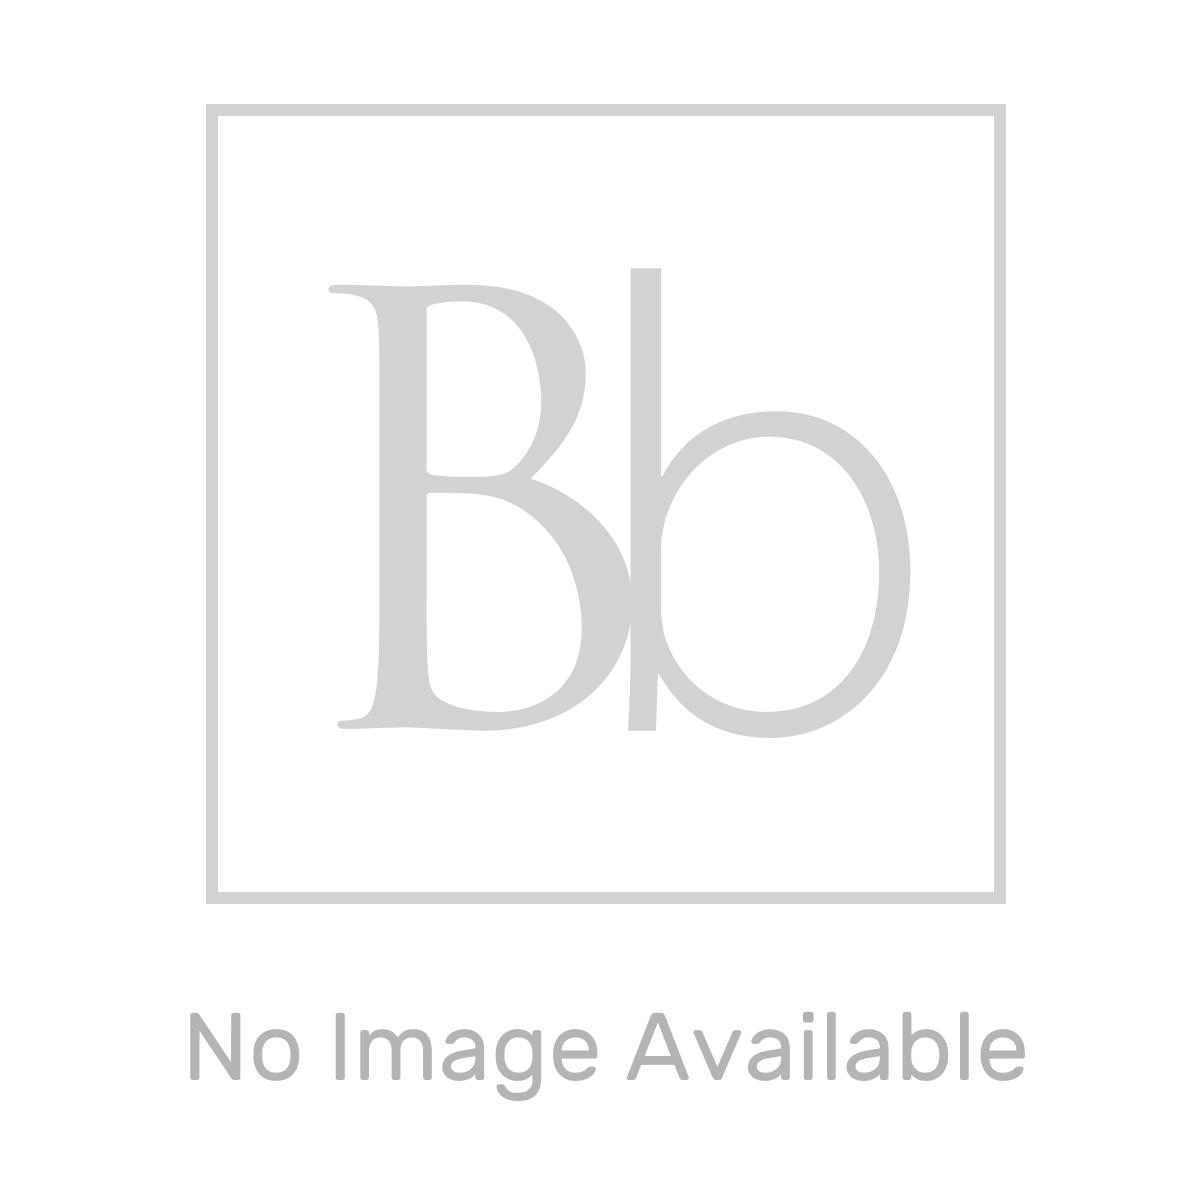 Zenith Stainless Steel Tall Bathroom Cabinet Inside